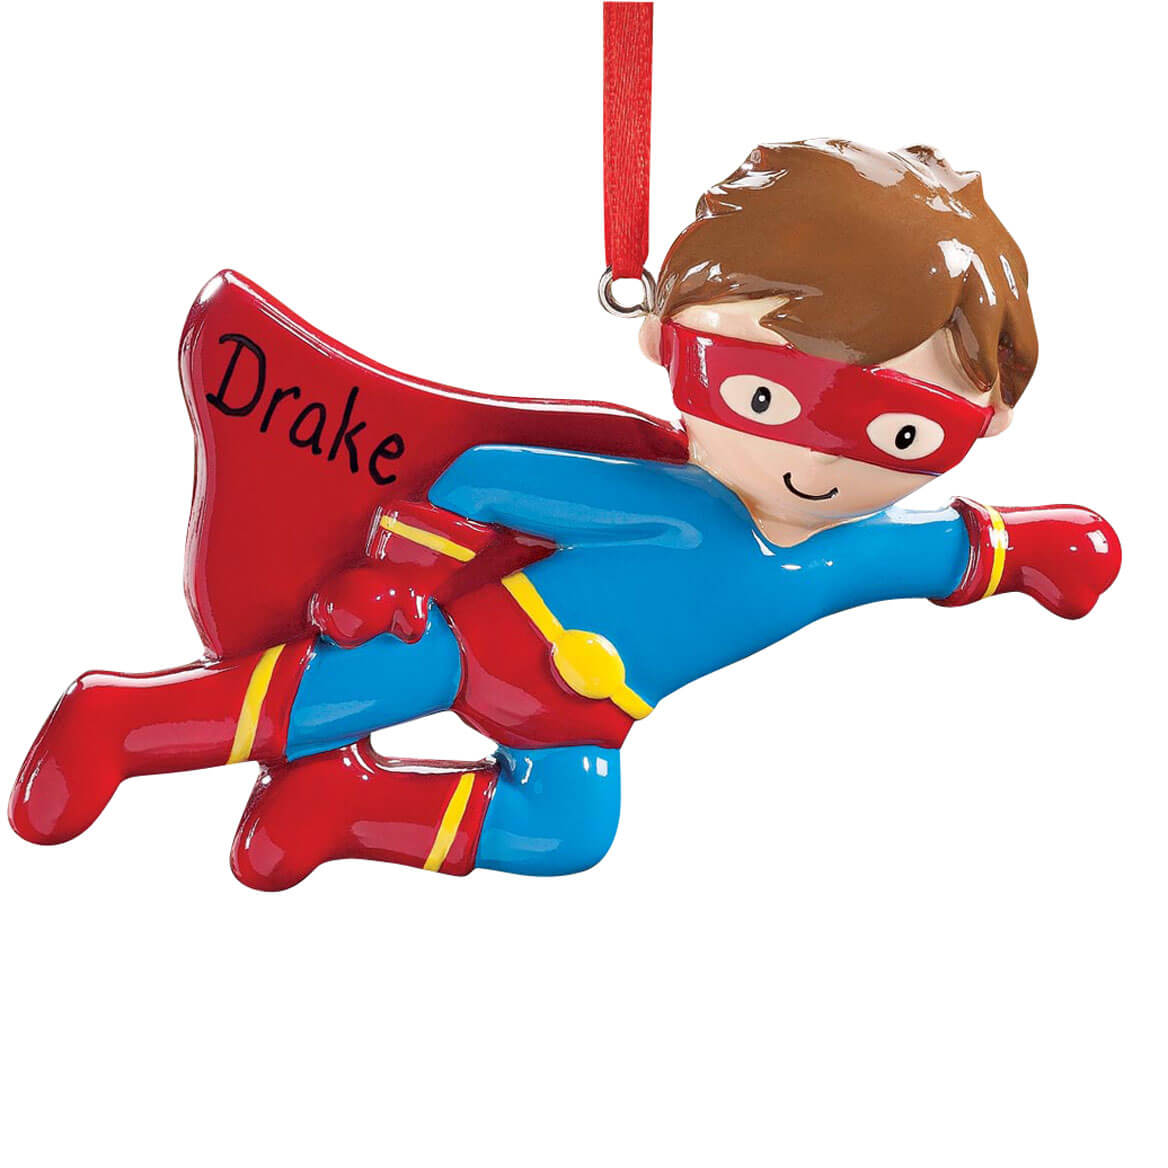 Personalized Superhero Ornament-356831